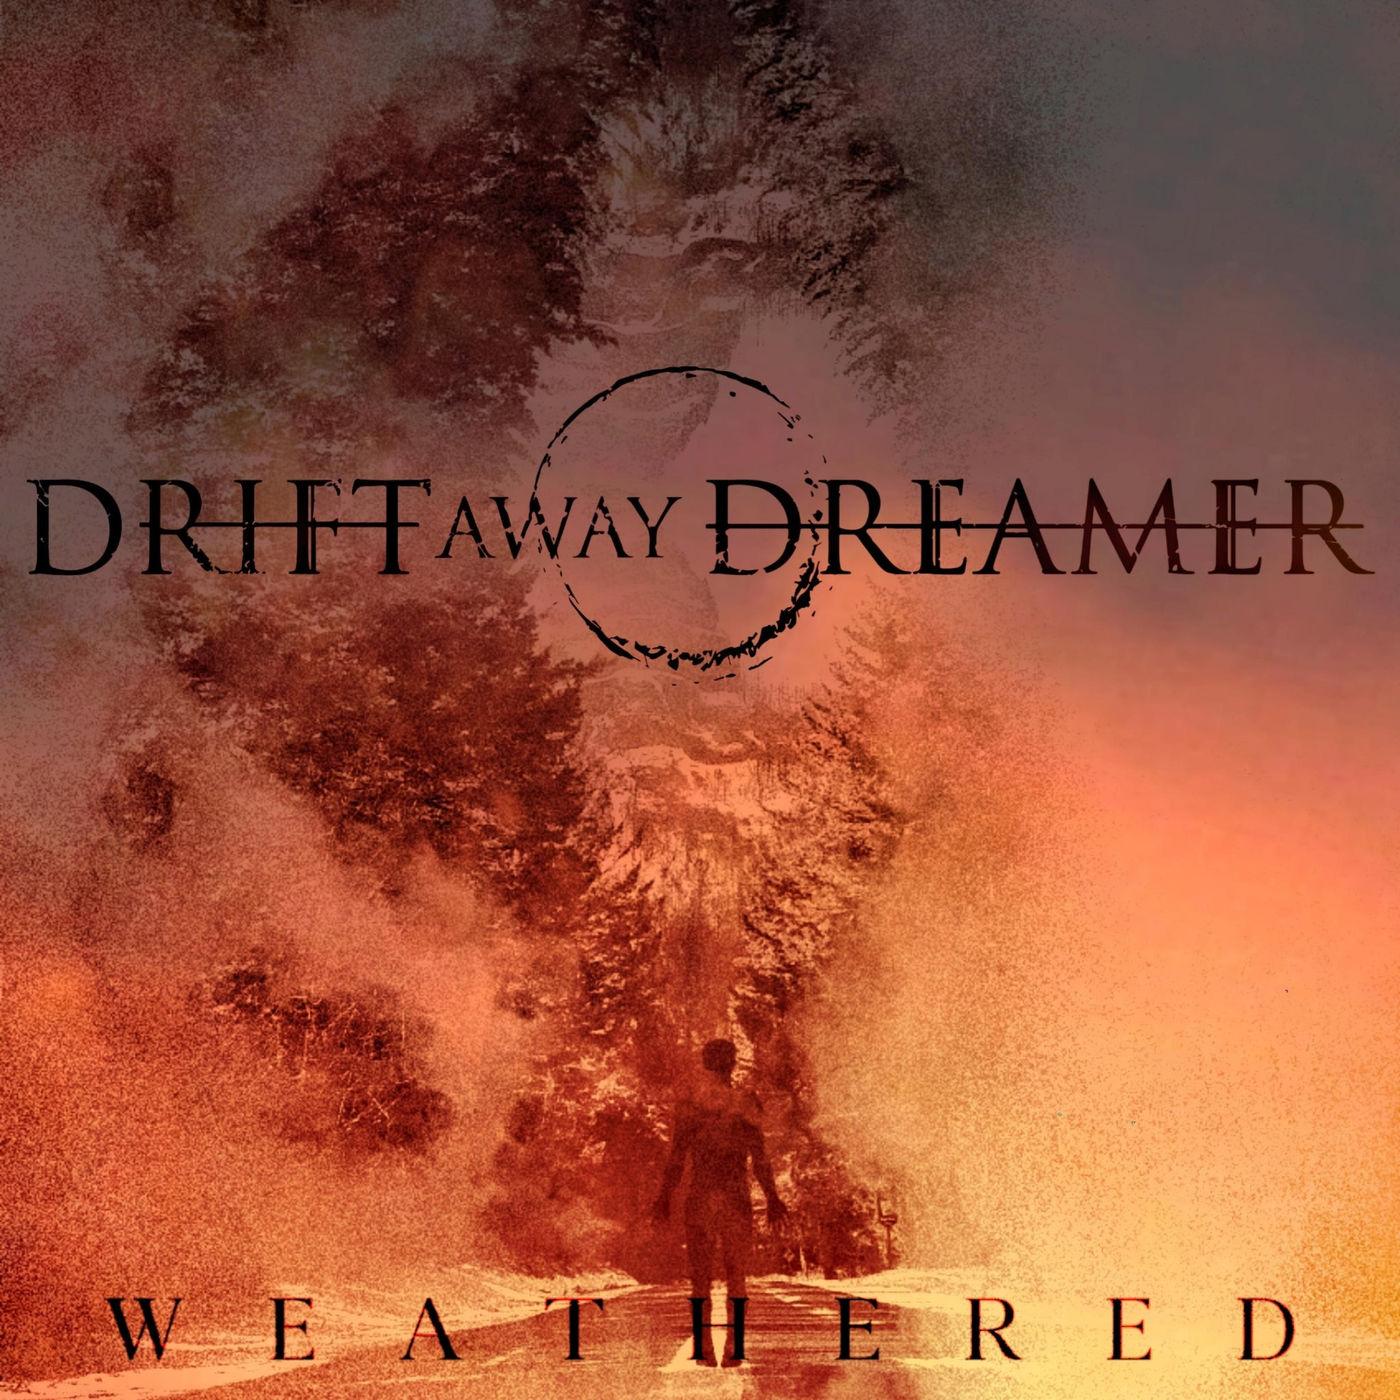 Drift Away Dreamer - Weathered (2020)